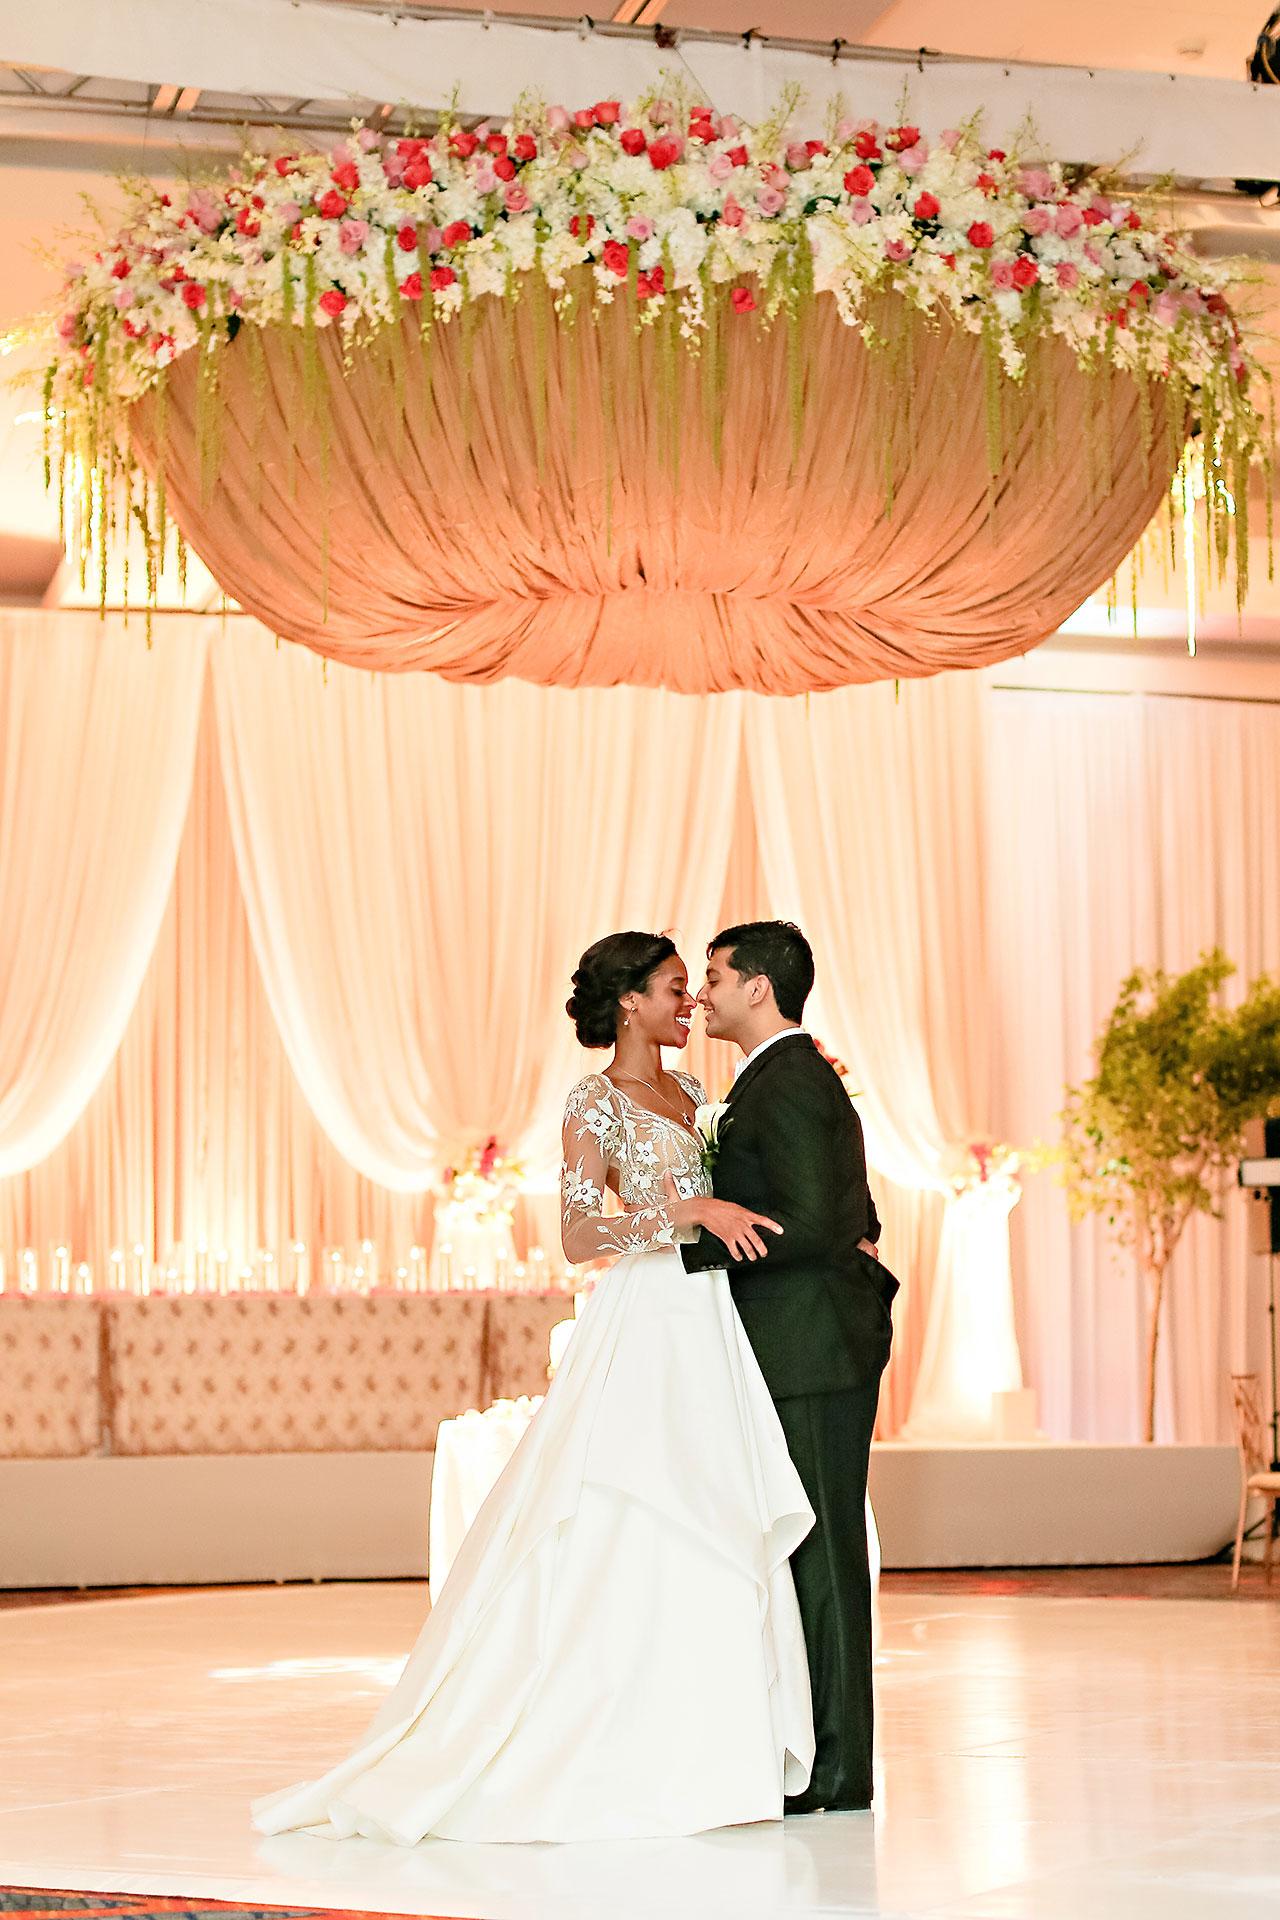 Joie Nikhil JW Marriott Indianapolis Wedding 021